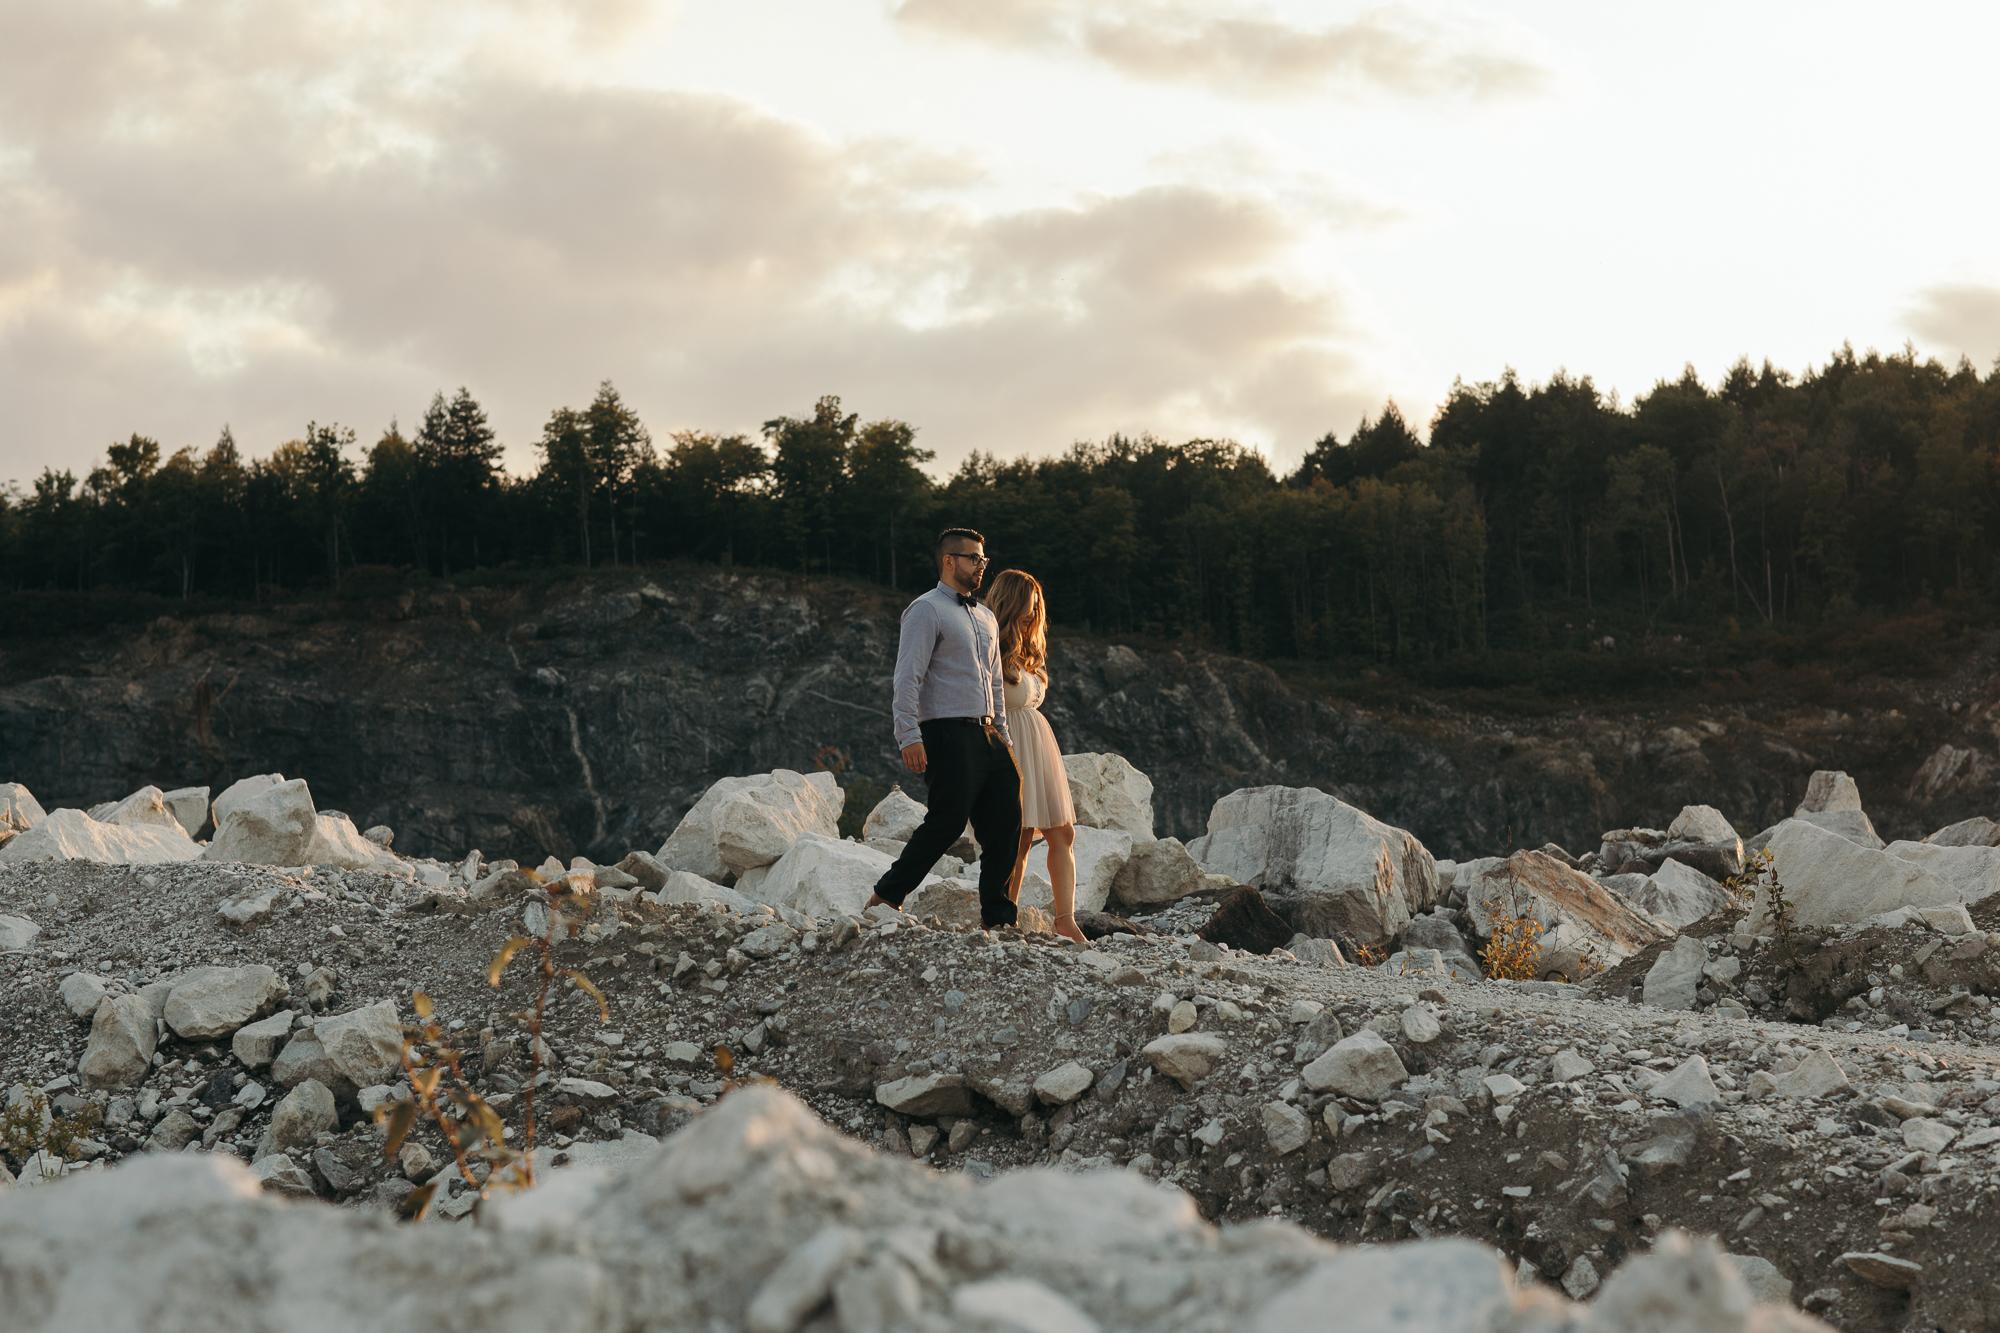 engagement photos at morrison u0026 39 s limestone quarry ottawa